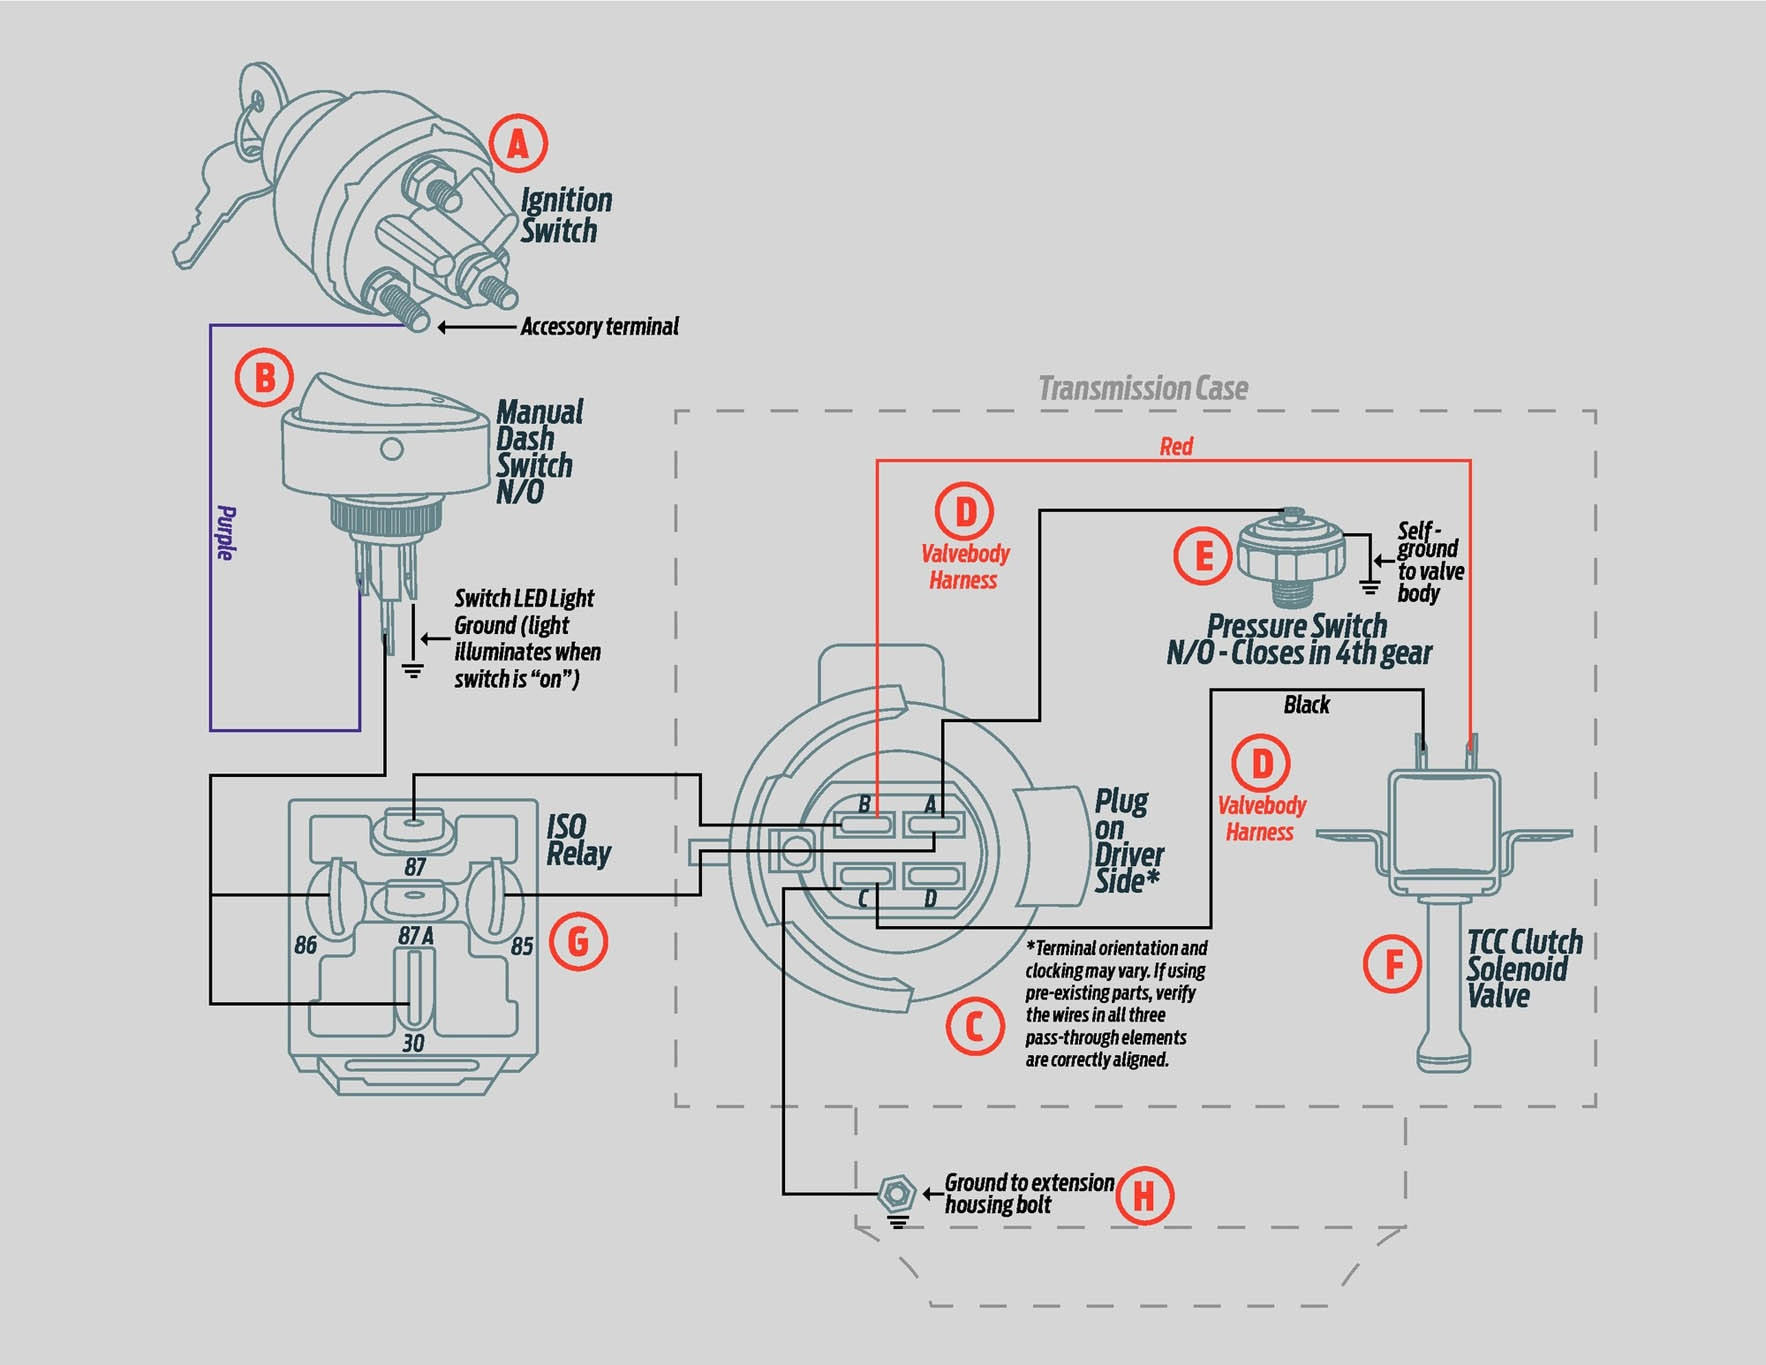 88 700r4 internal wiring diagram wiring diagrams konsult 4l60e wiring harness diagram besides 200r4 transmission lock up wiring [ 1766 x 1365 Pixel ]